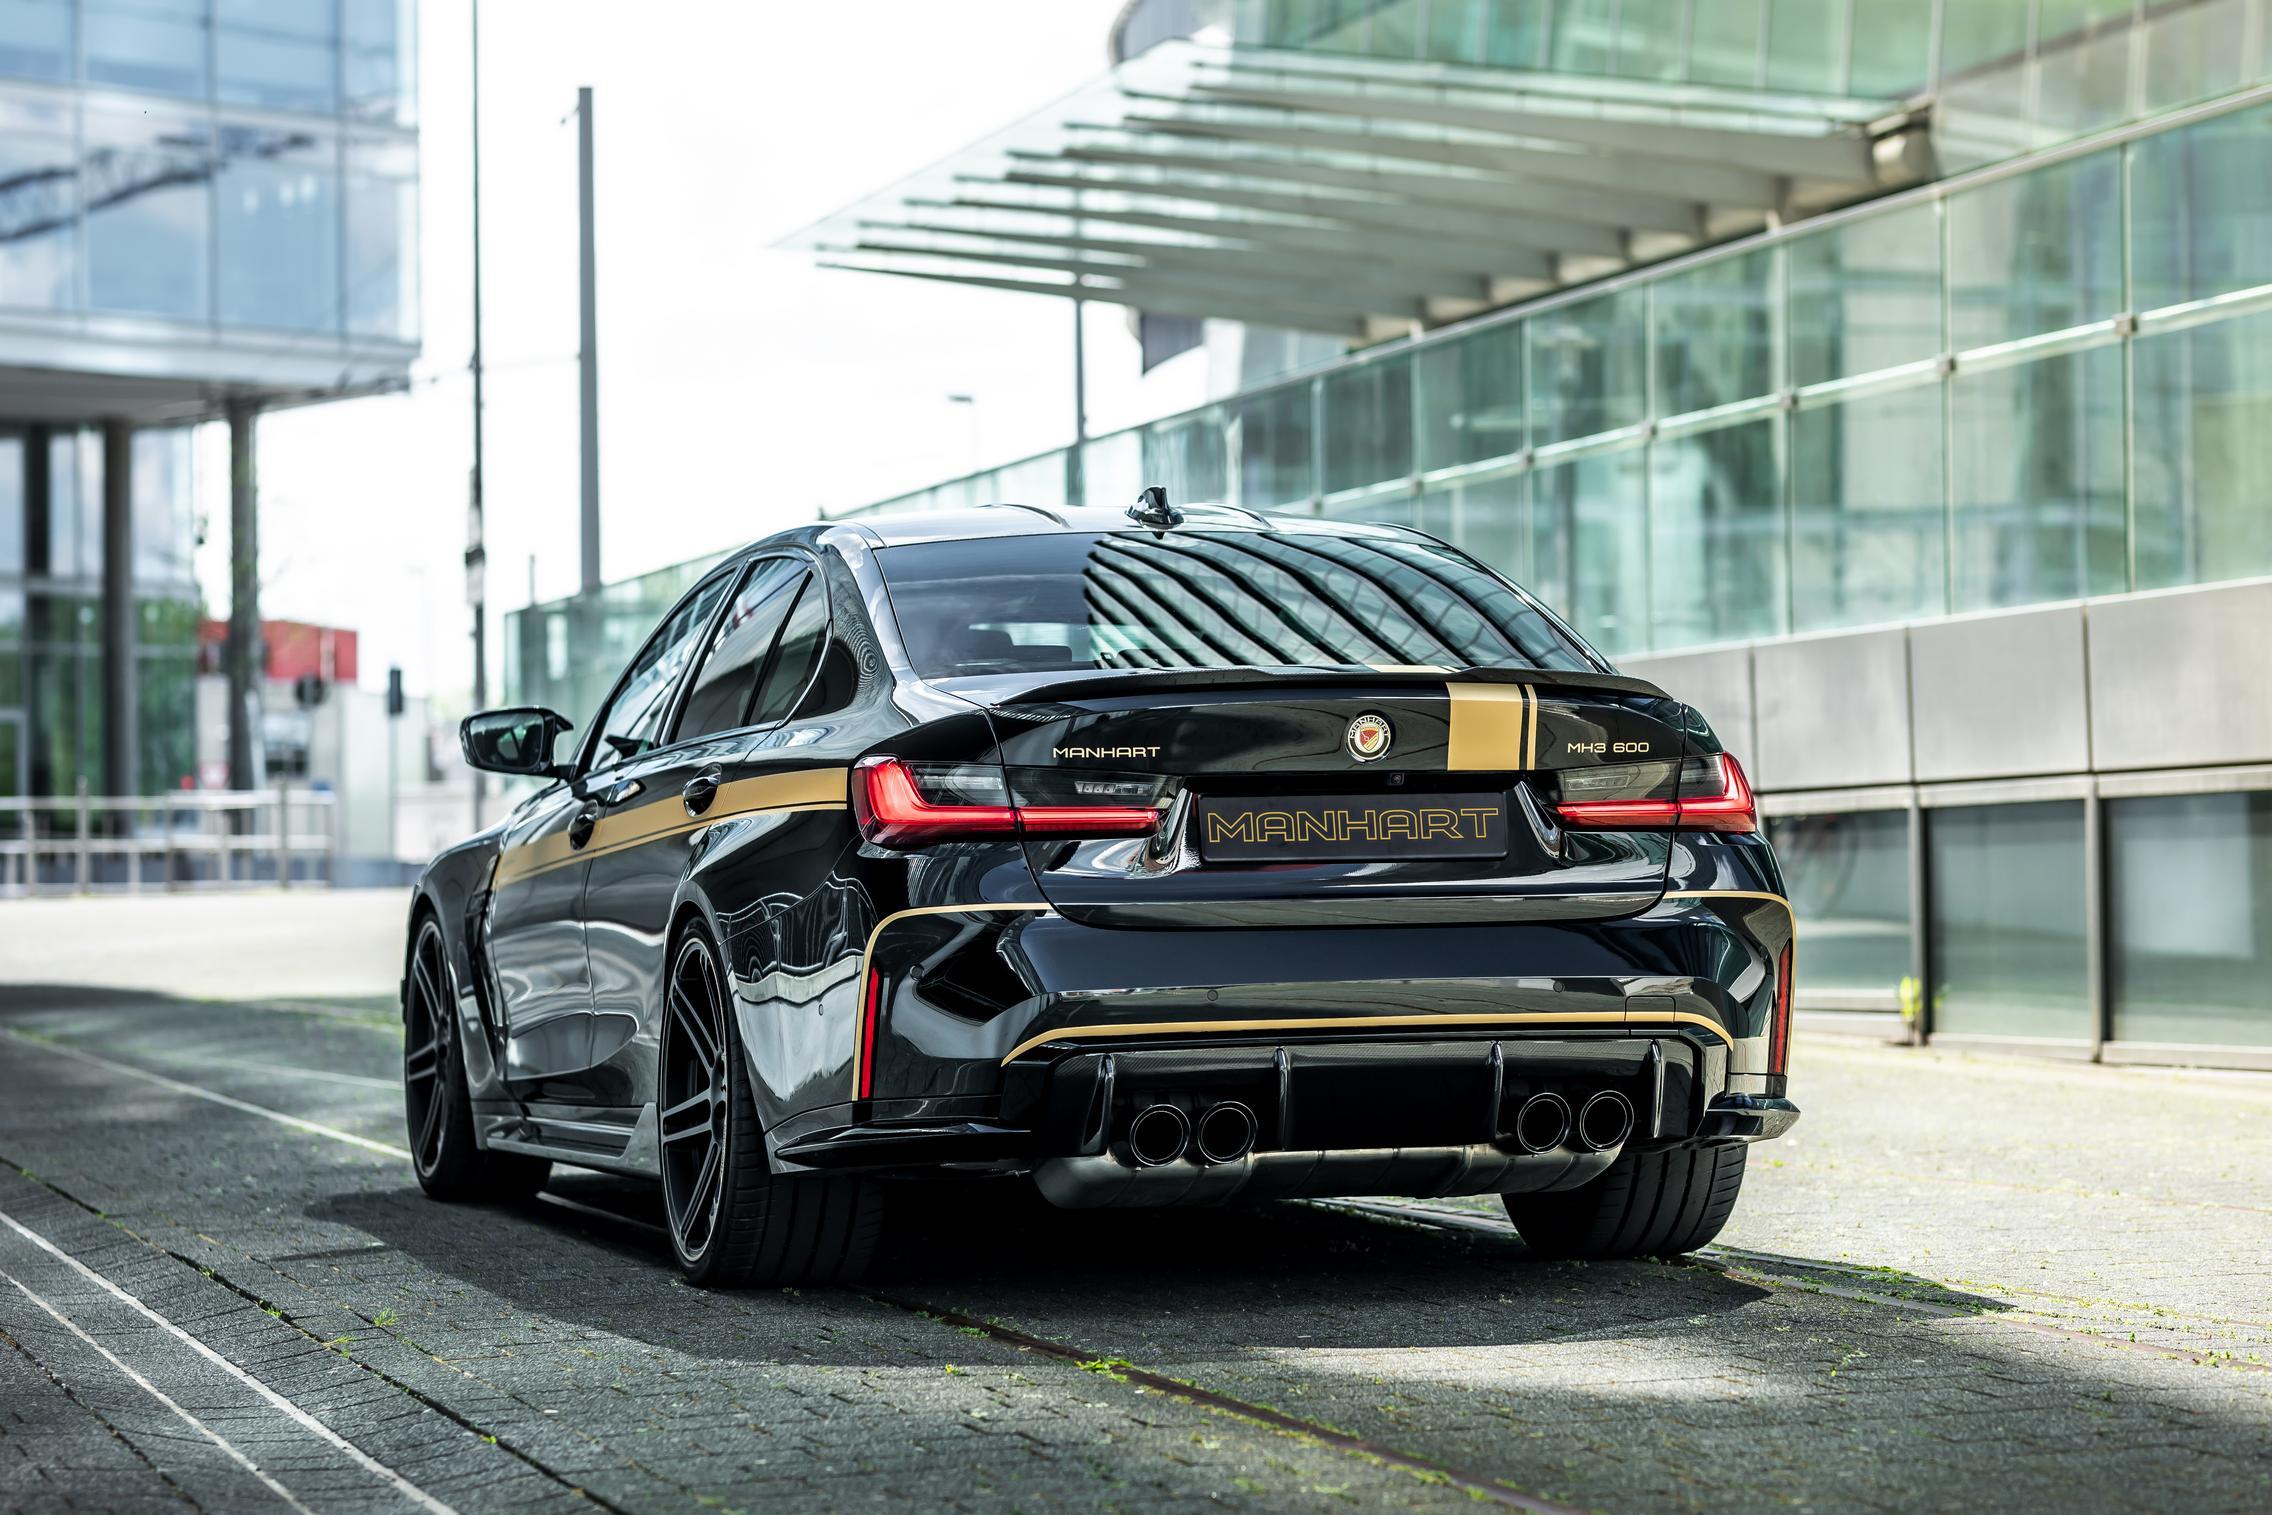 Manhart BMW M3 Competition rear